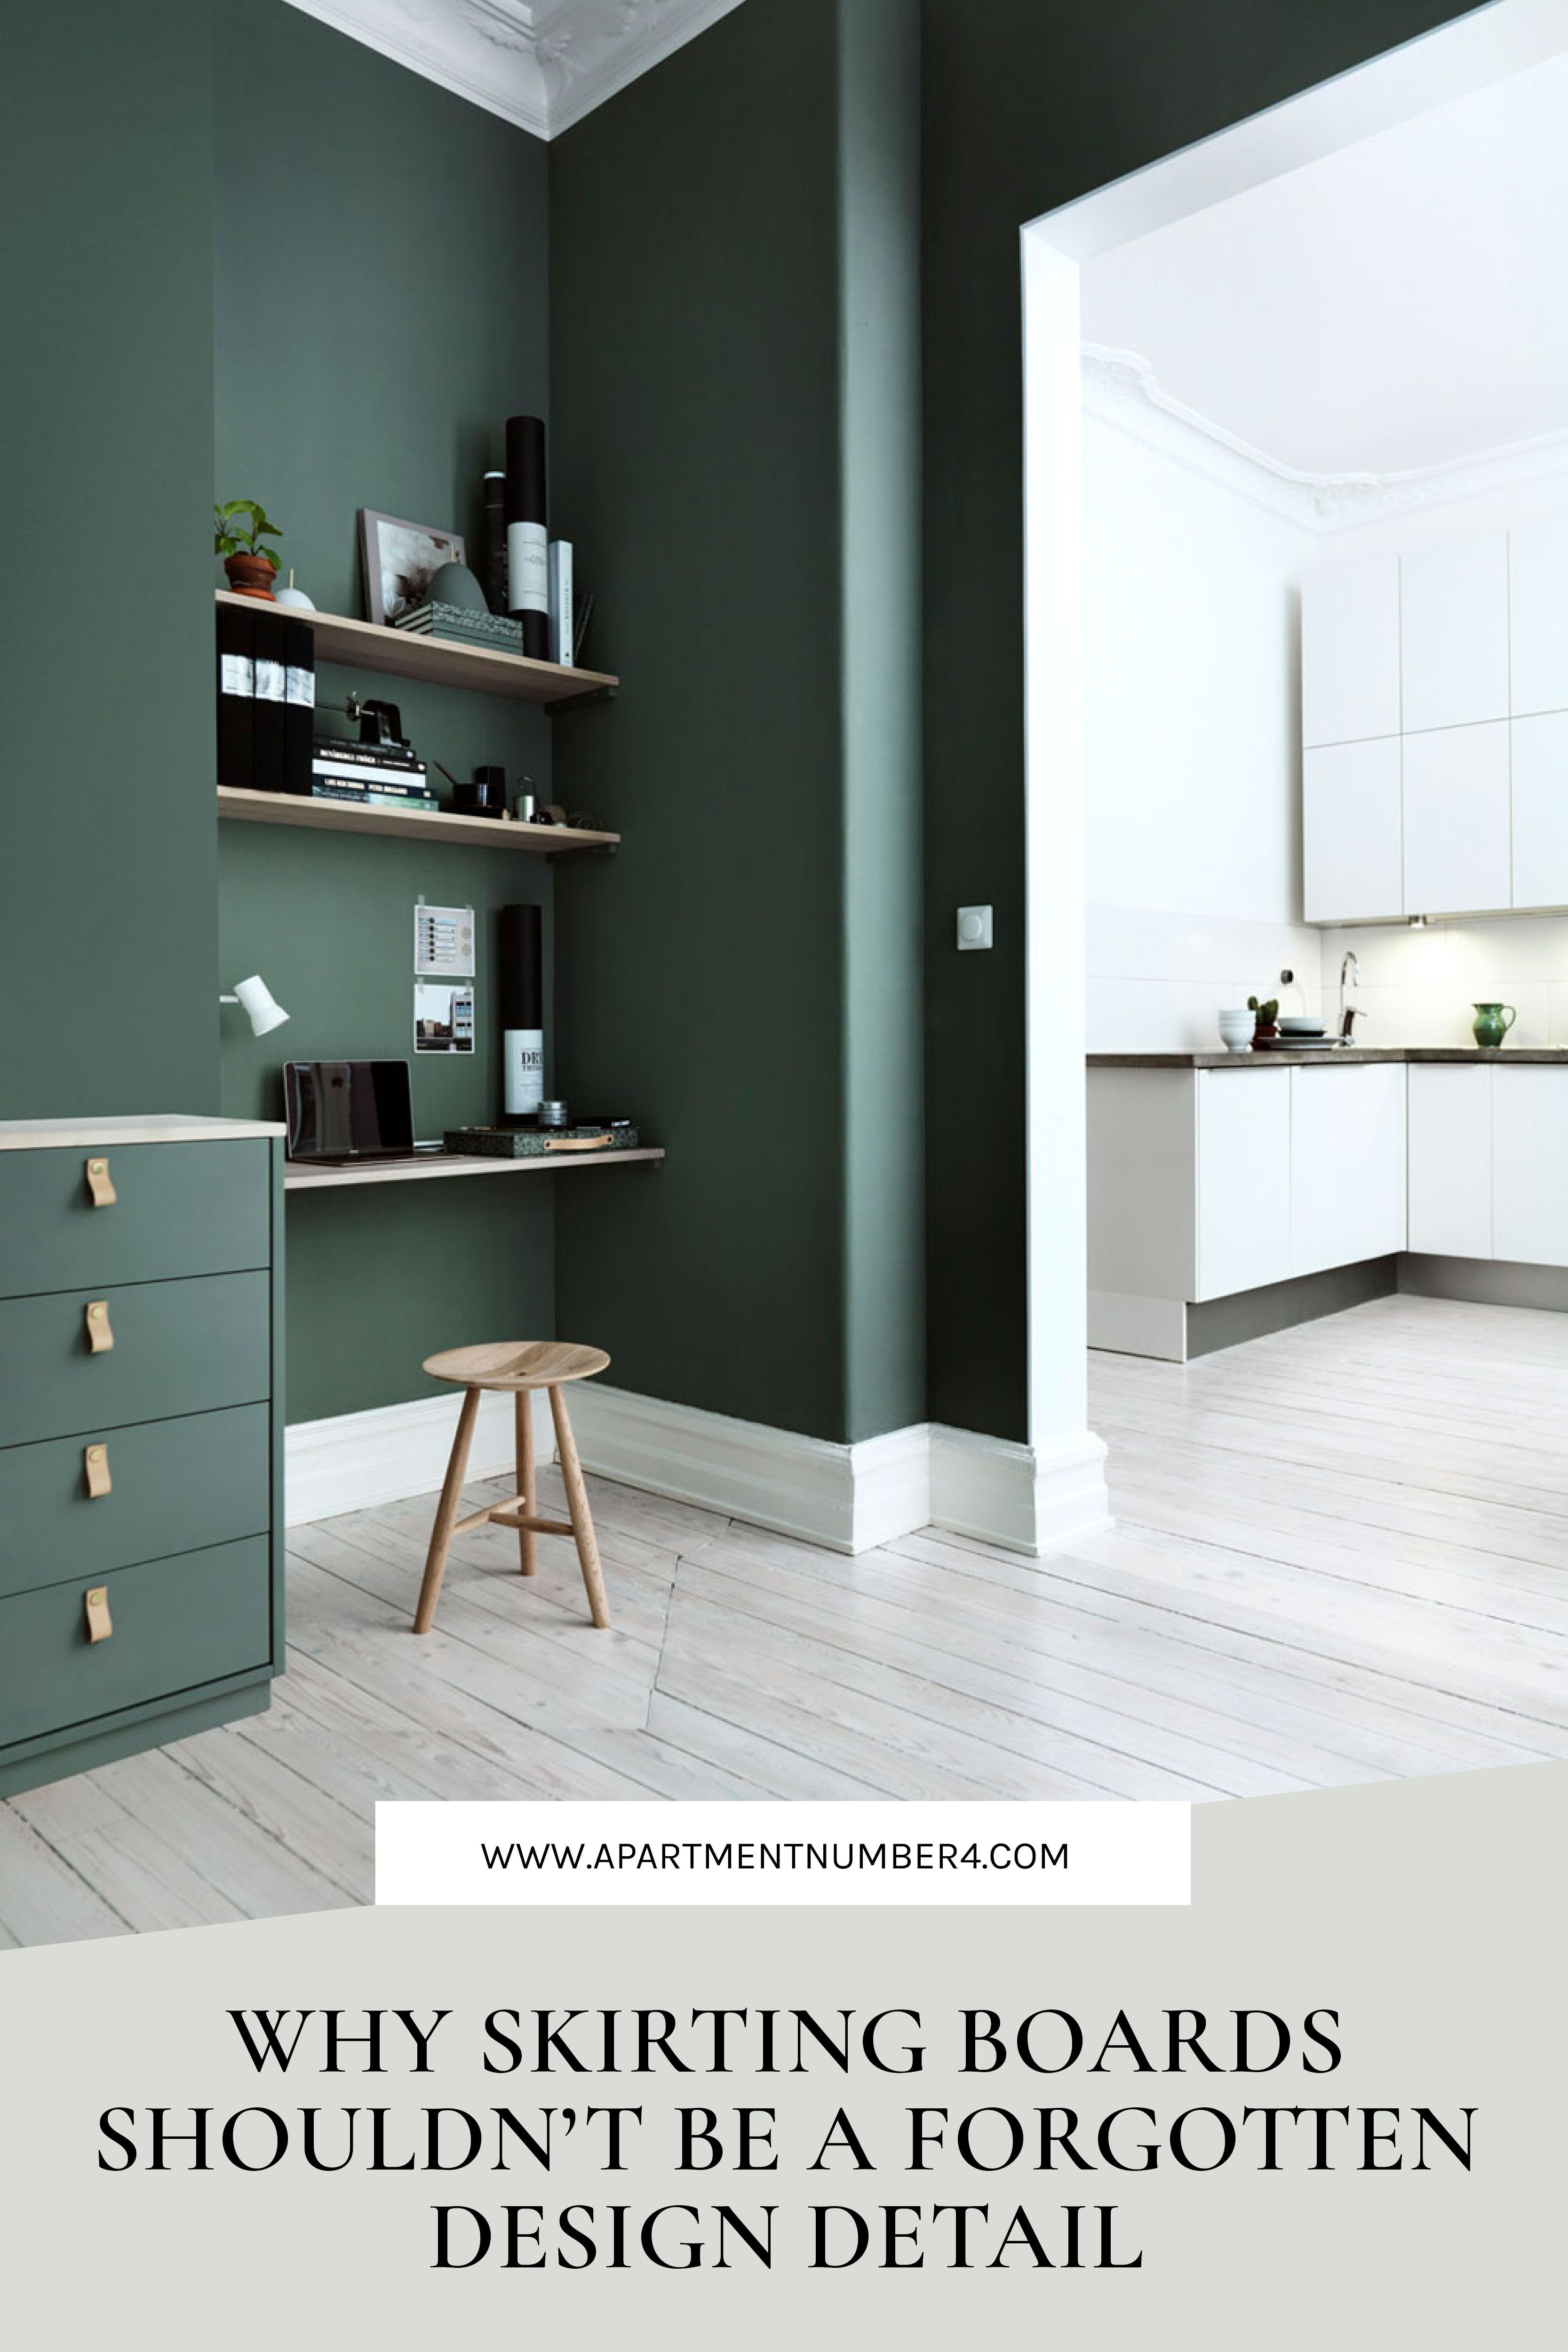 Skirting Board Interior Design Ideas Living Room Paint Green